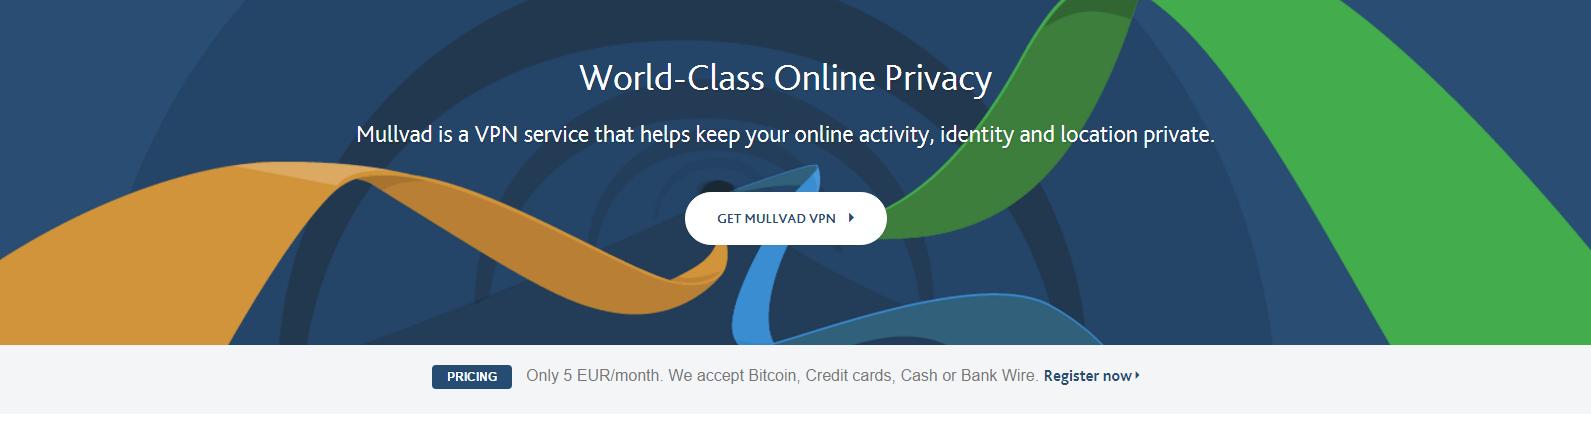 Cyberoam ssl client free download